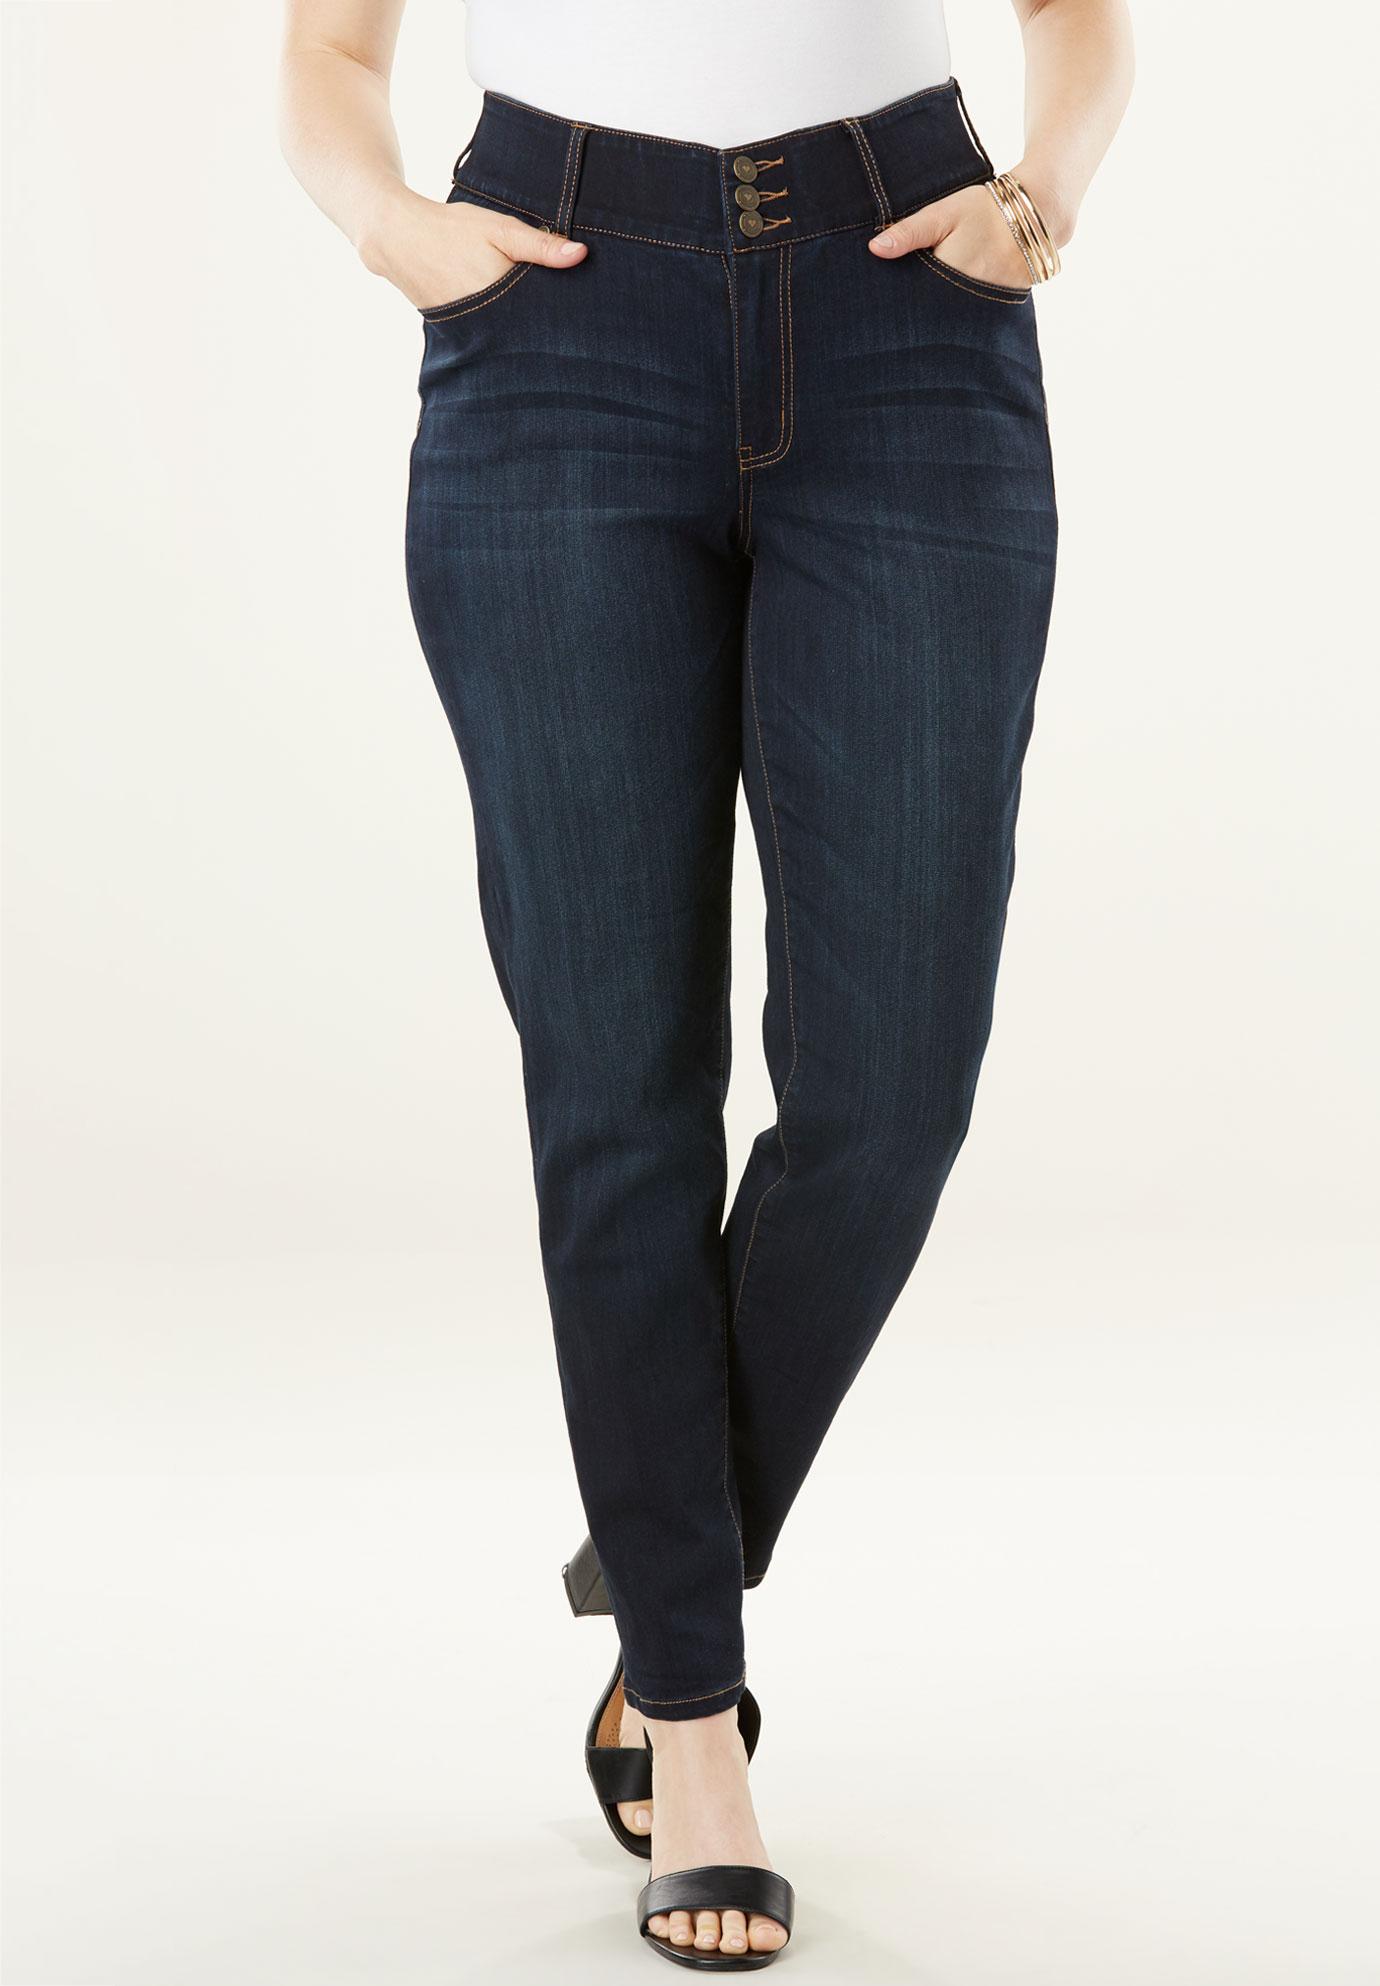 4016a632067 The Curvy Skinny Jean by Denim 24 7®